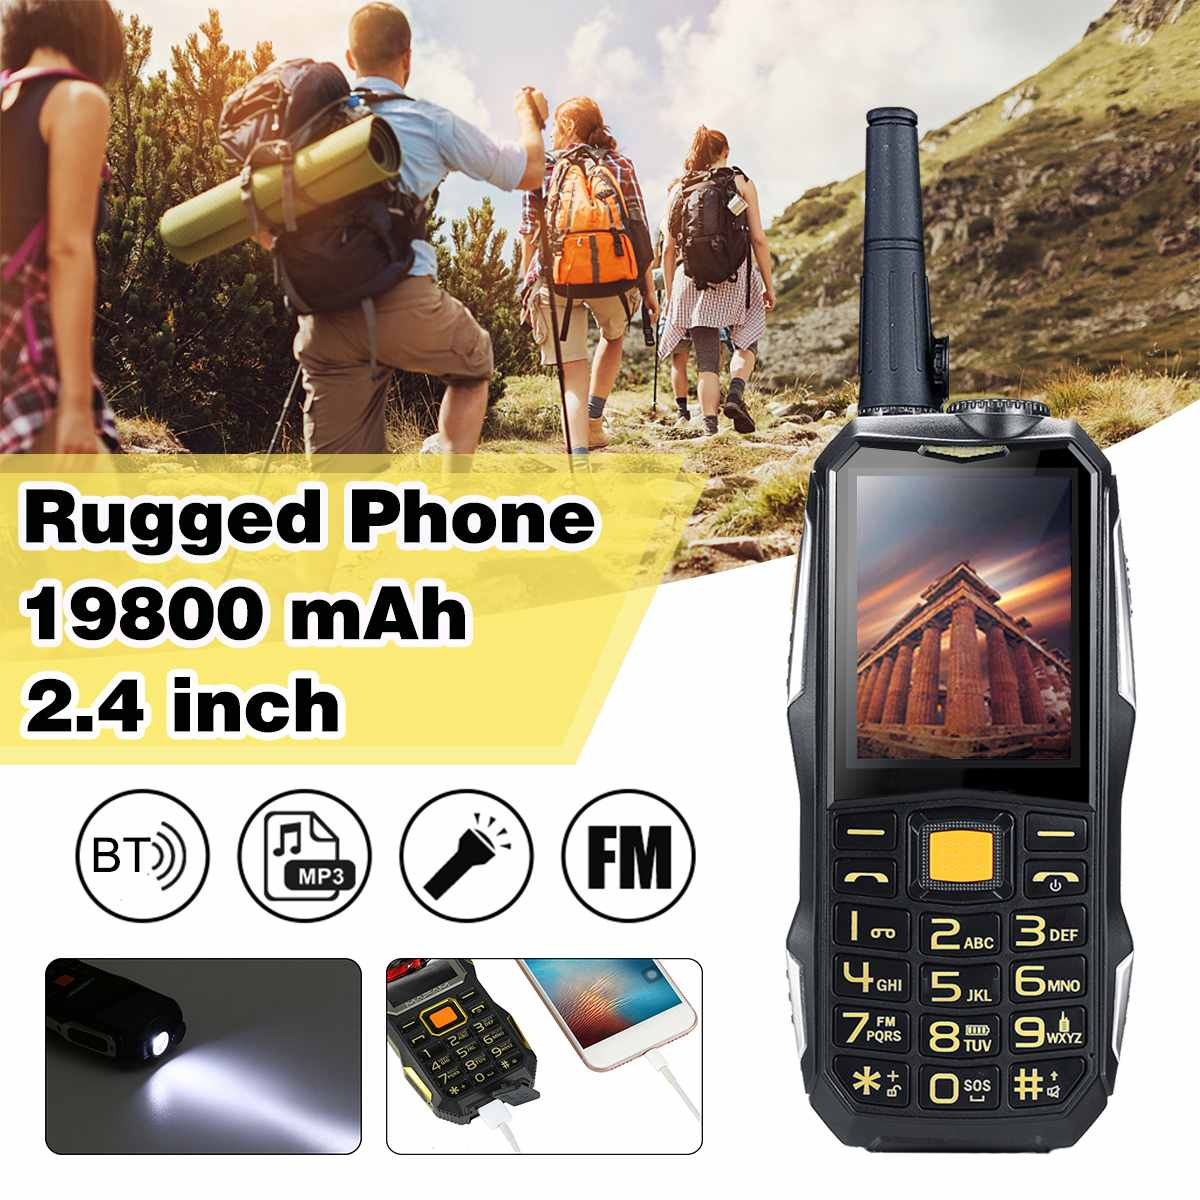 19800Mah Waterproof Shockproof Rugged Phone Walkie Talkie Phone Support Power Bank Flashlight Dual Sim Gsm Smartphone Fm Radio